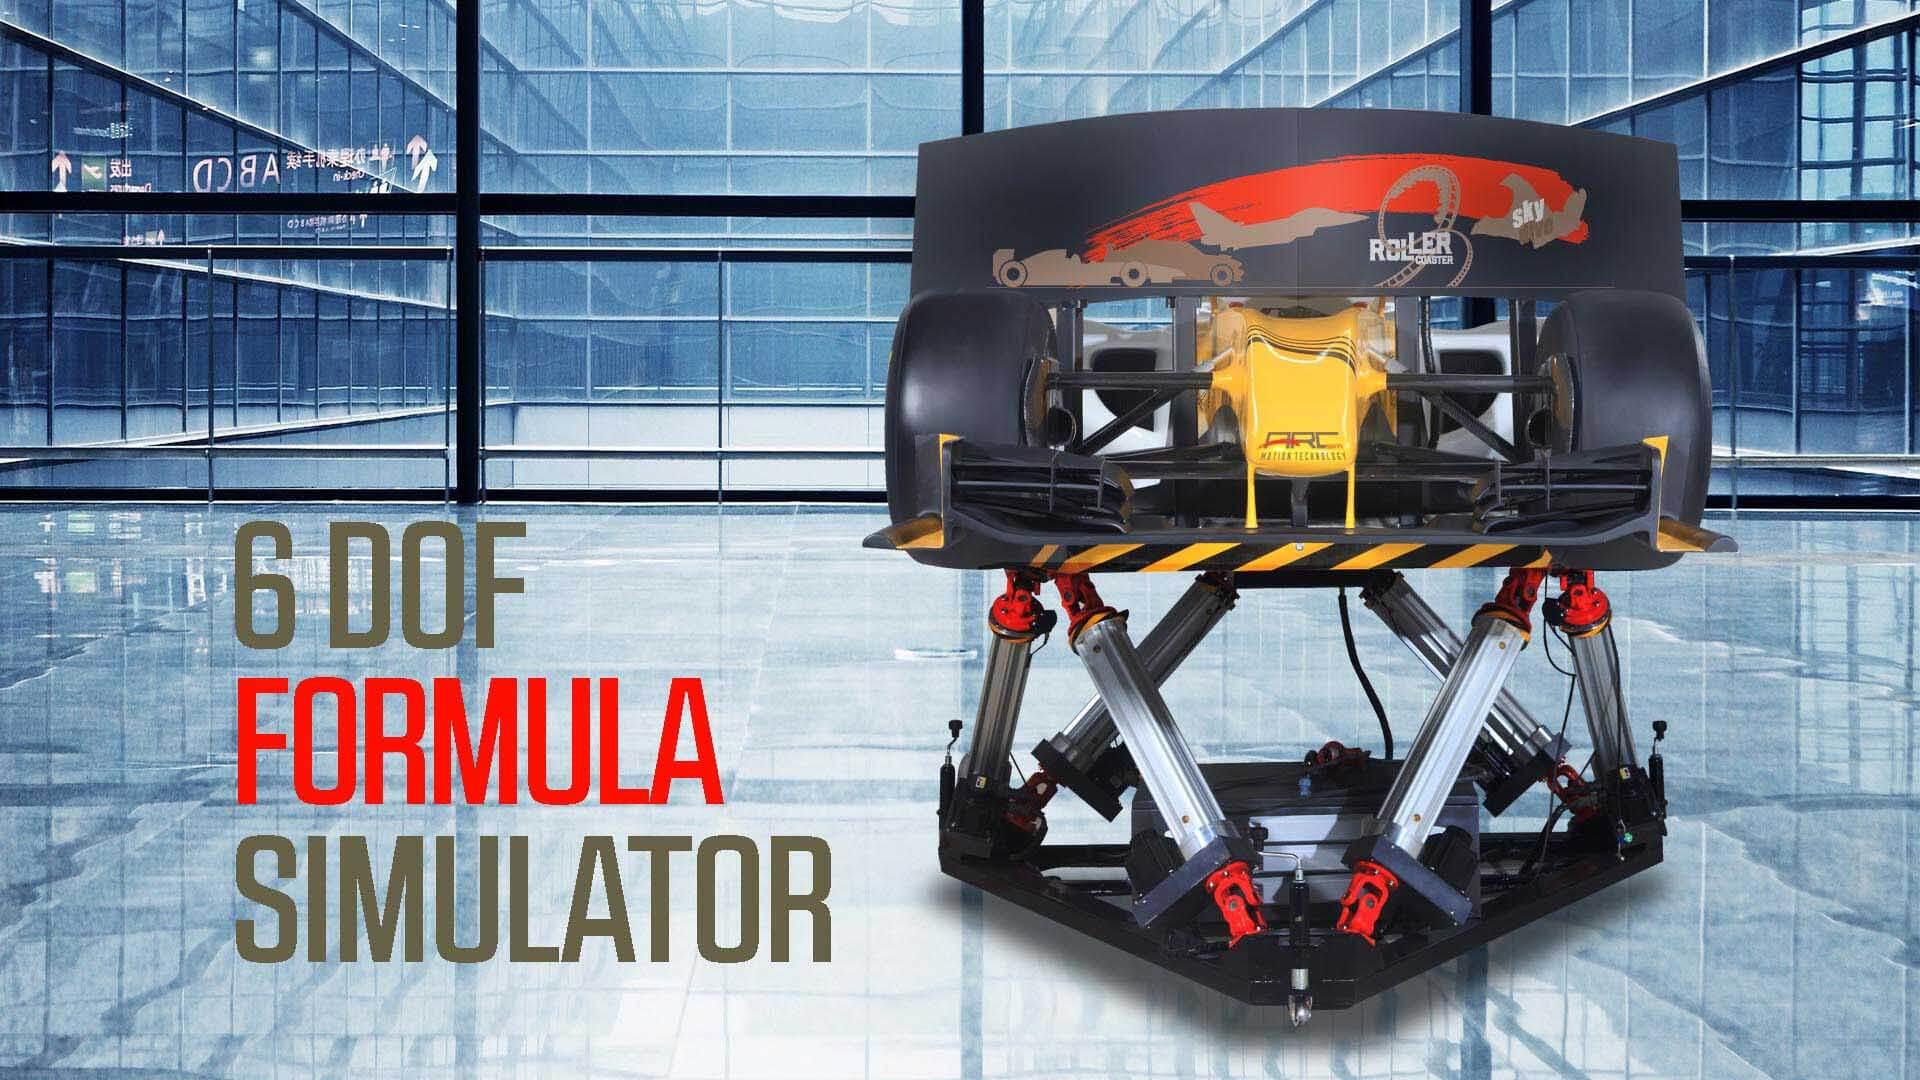 6 Dof Simulator